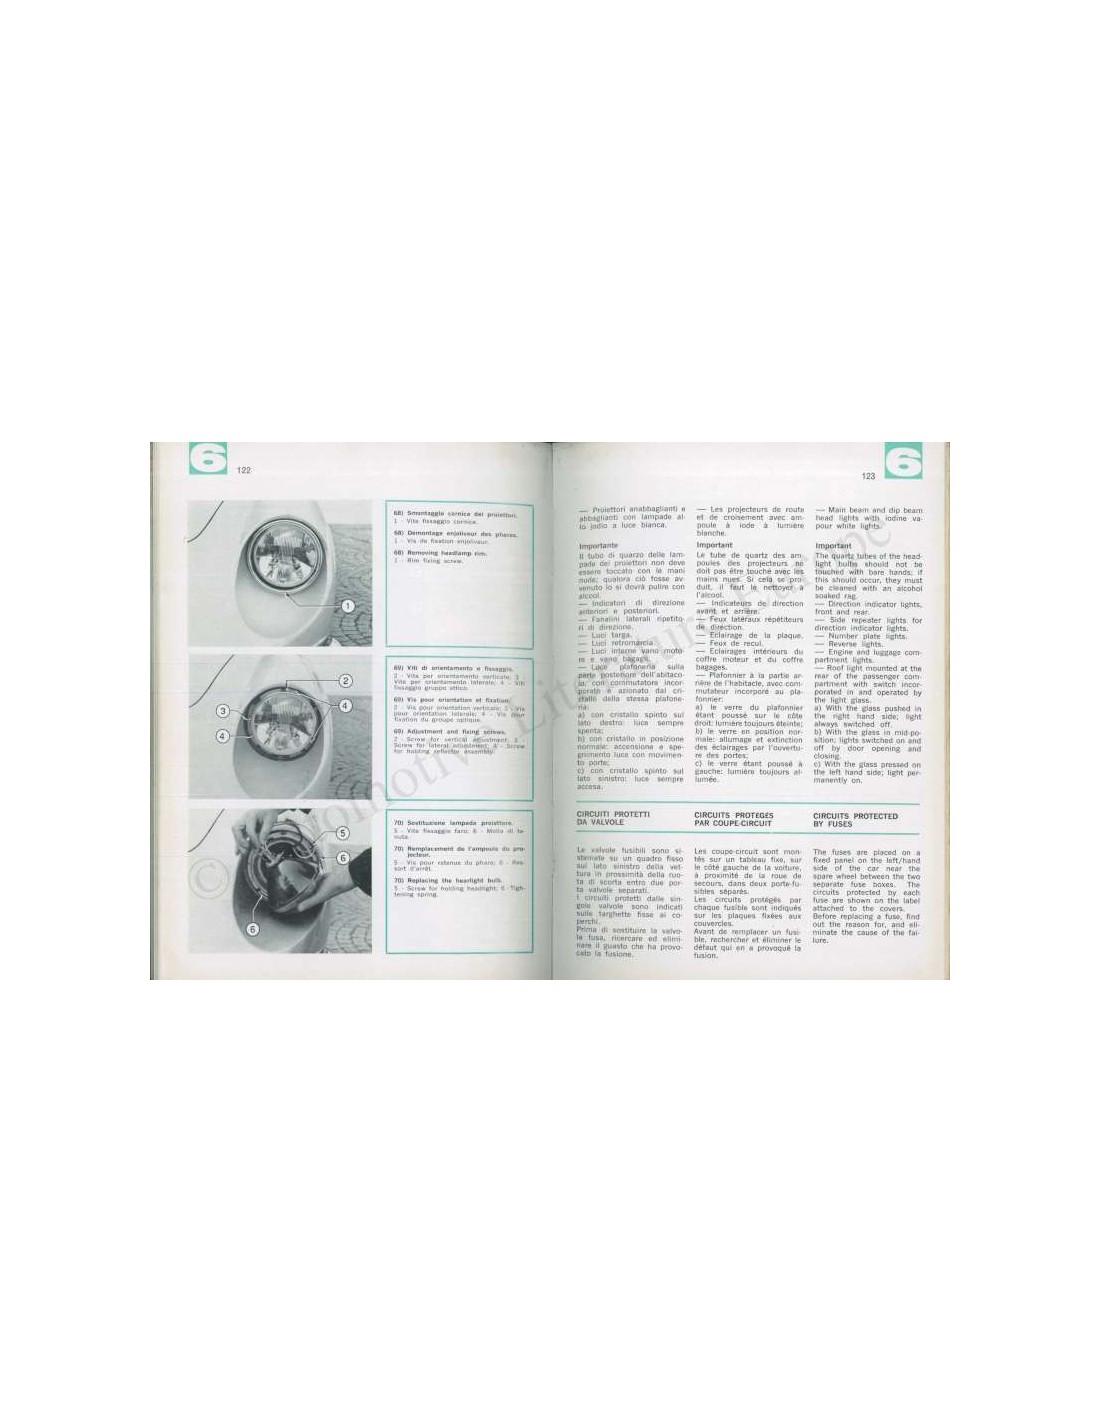 Ferrari Repair Manuals: 1970 FERRARI DINO 246 GT OWNERS MANUAL